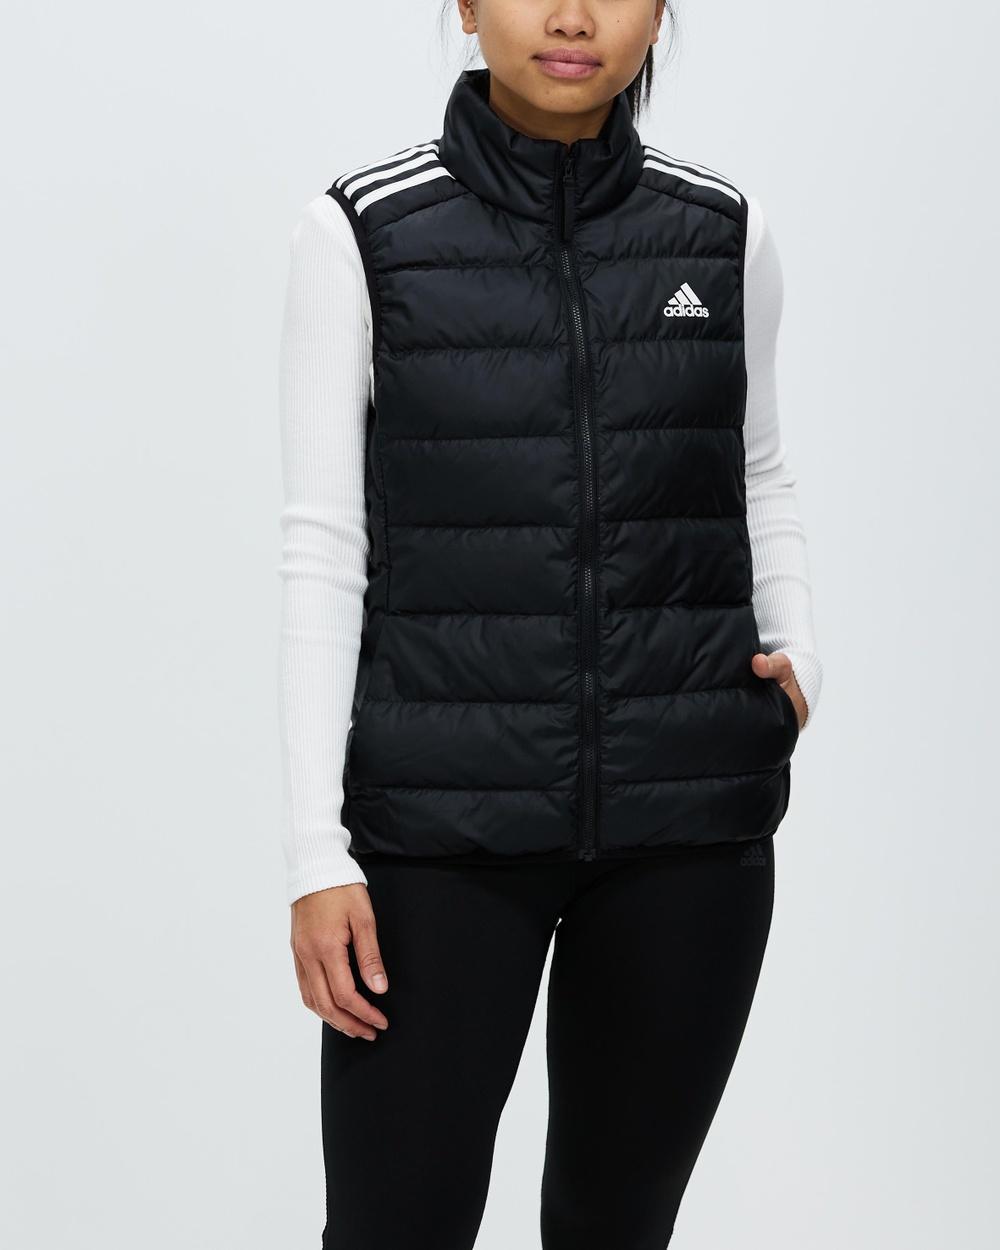 adidas Performance Essentials Light Down Vest Coats & Jackets Black